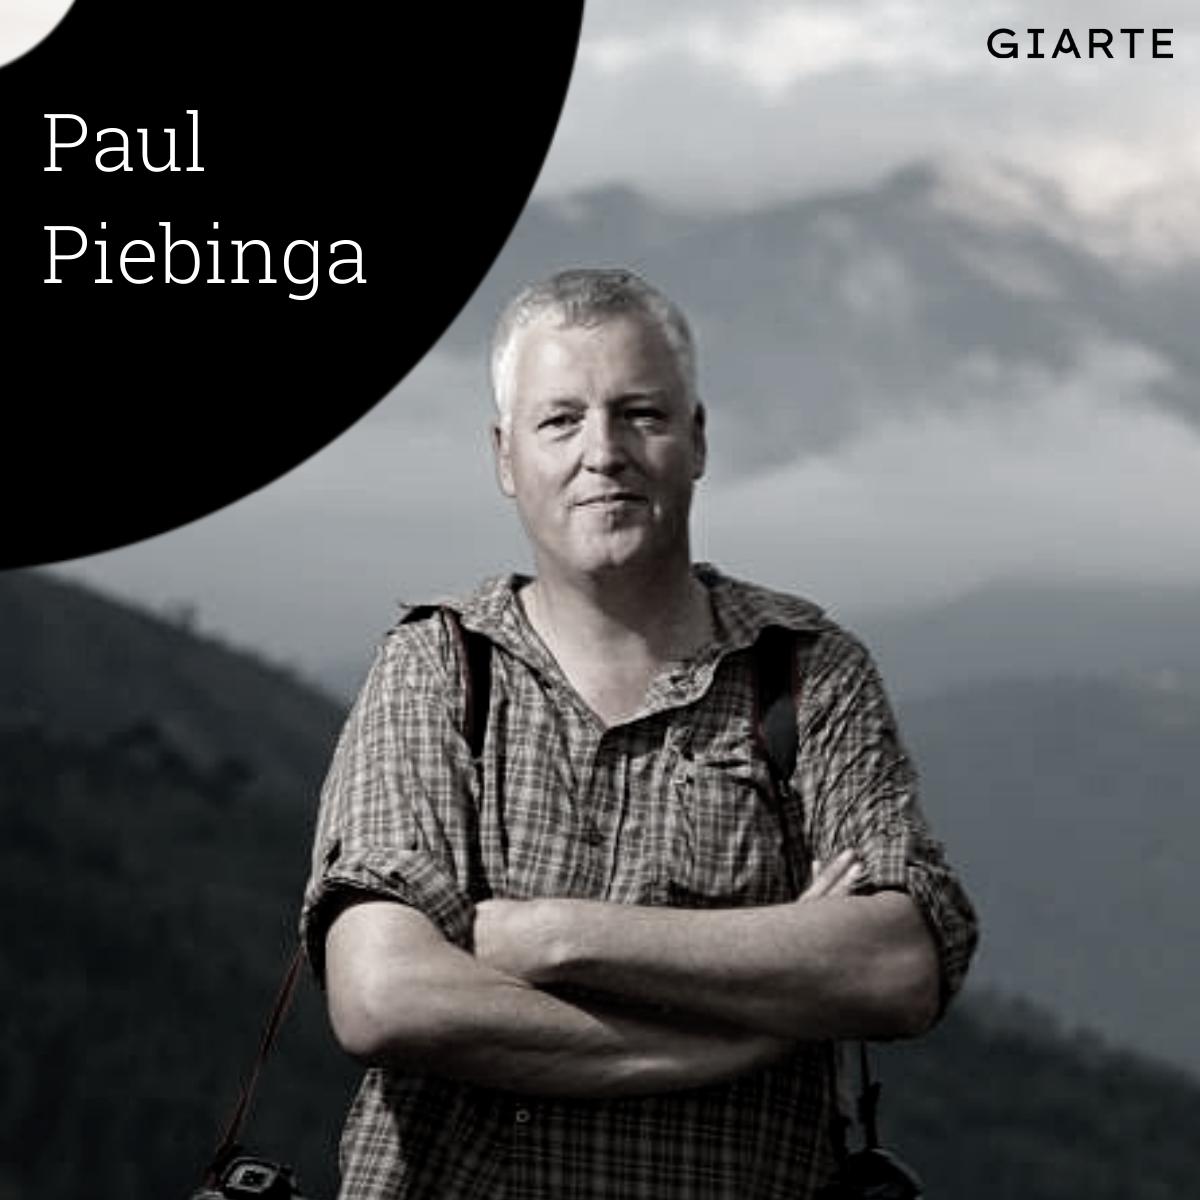 Digital Brand Experience 2.0 with Paul Piebinga (Dutch)